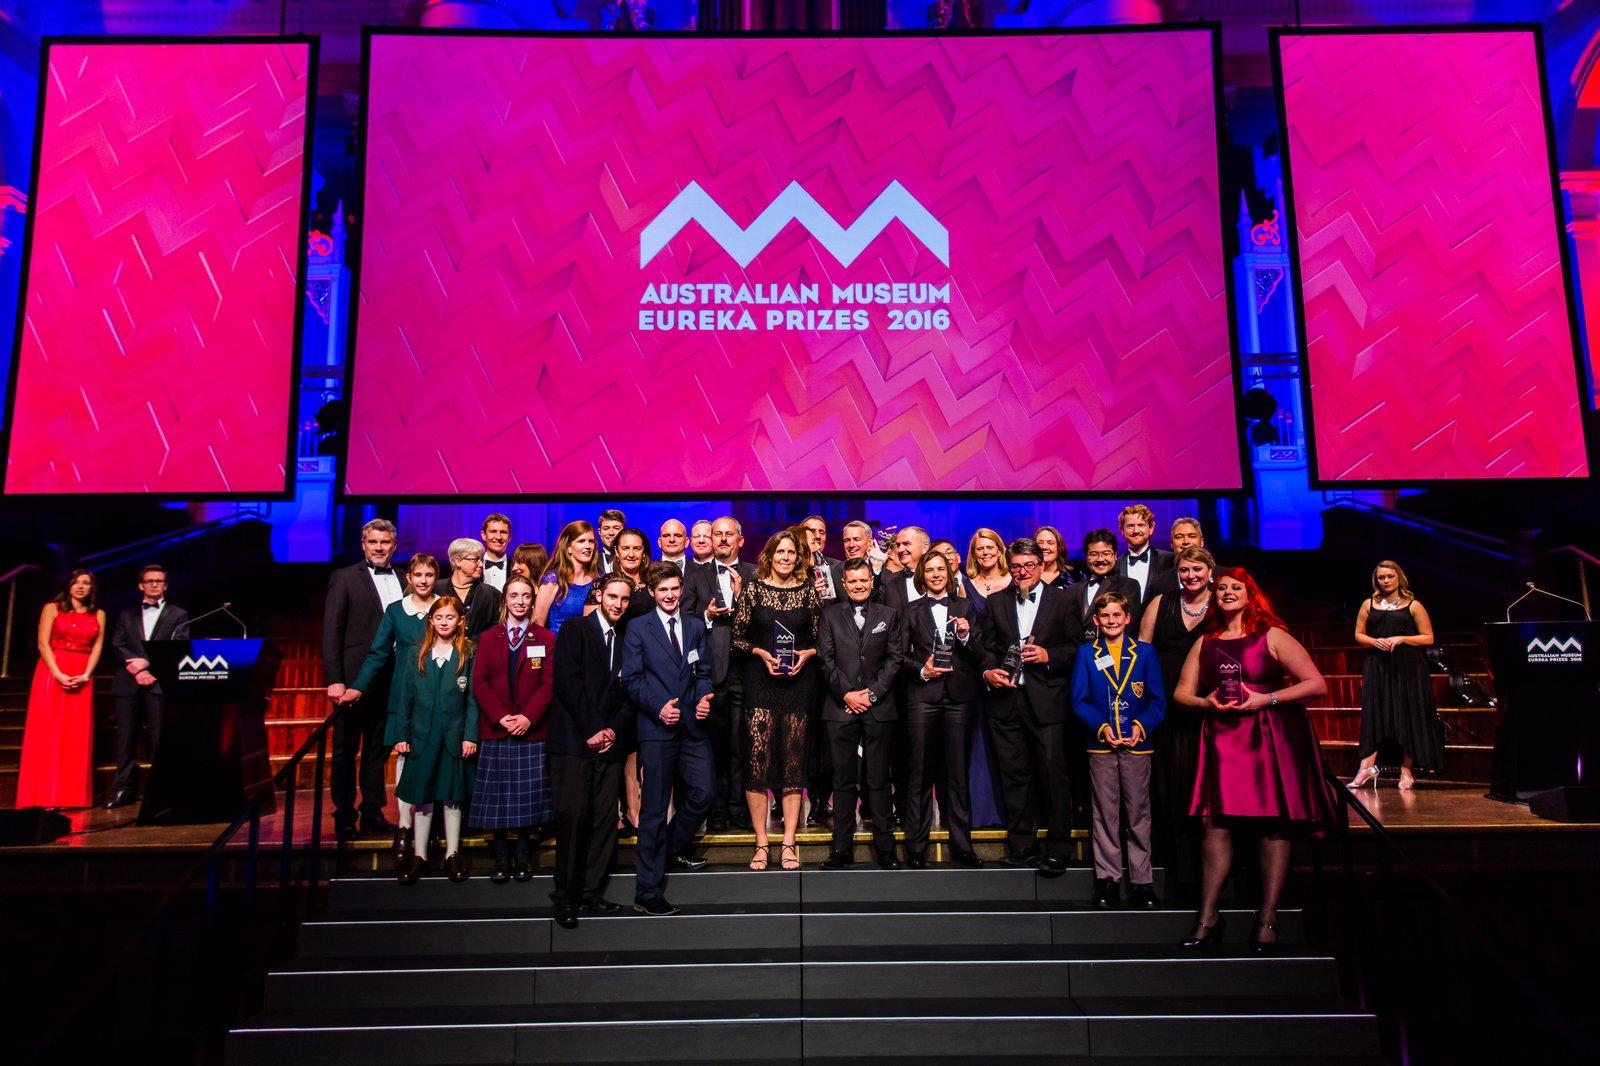 2016 Australian Museum Eureka Prizes winners